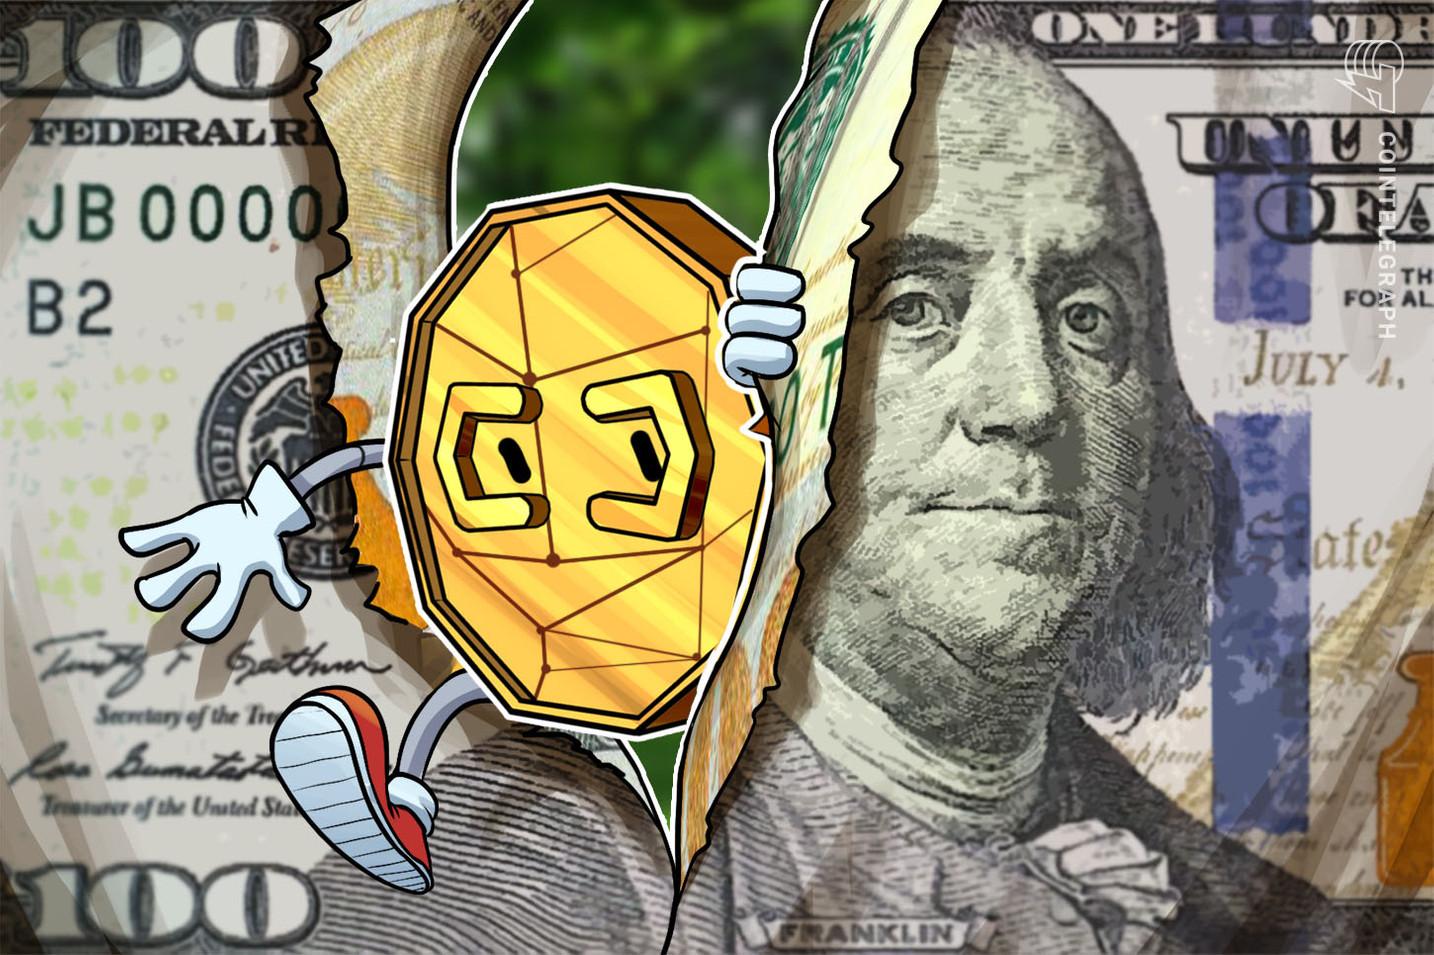 US Digital Currency